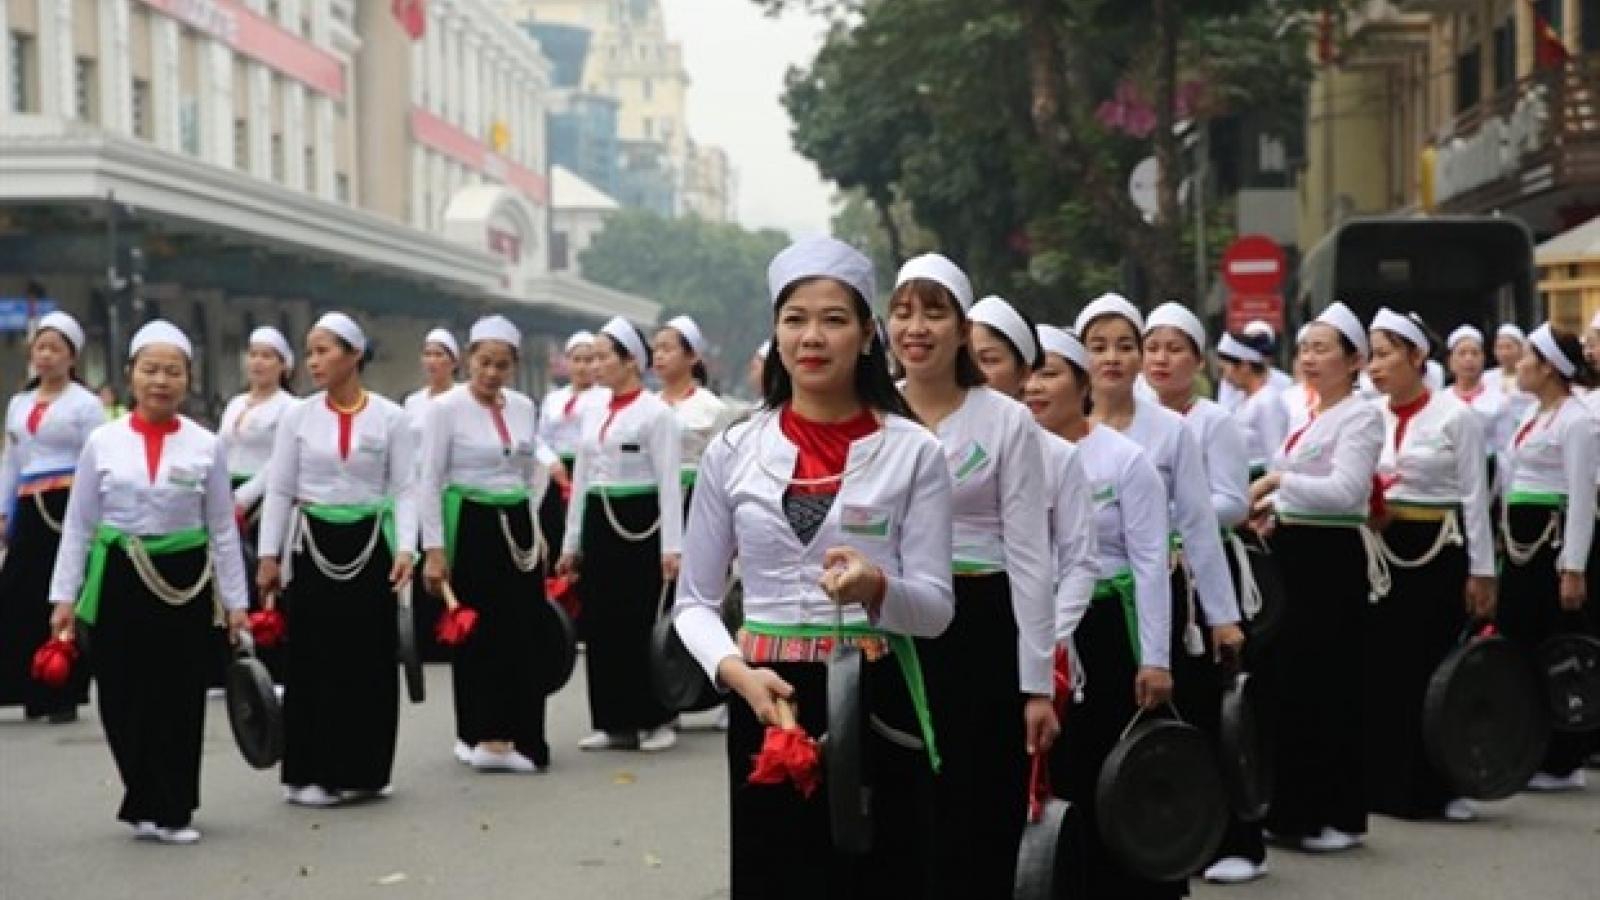 Hoa Binh culture on show in downtown Hanoi